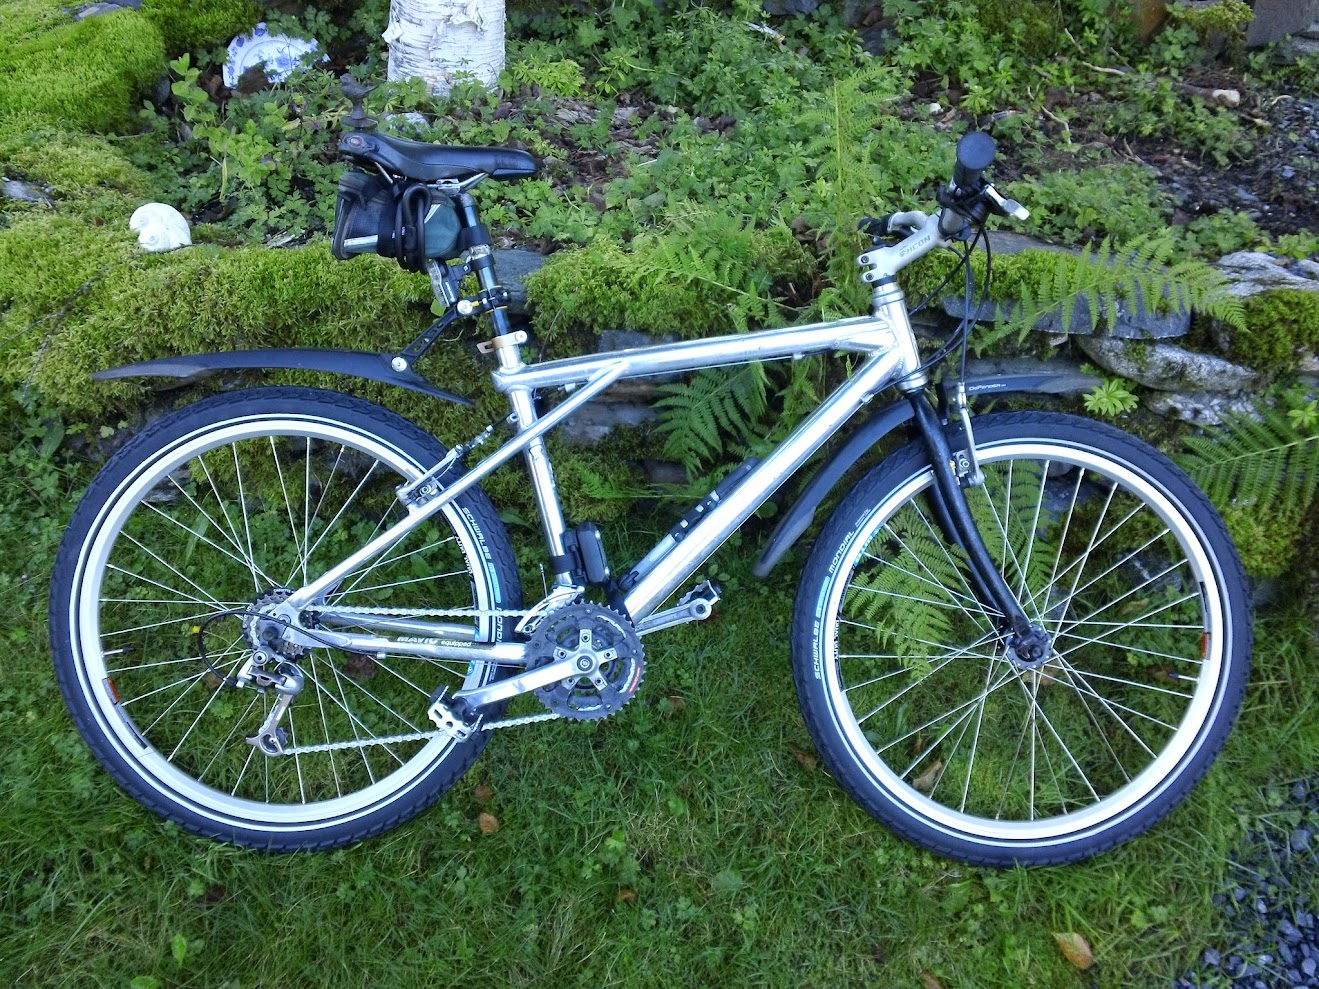 Chuck's GT Hardtail Mountain Bike